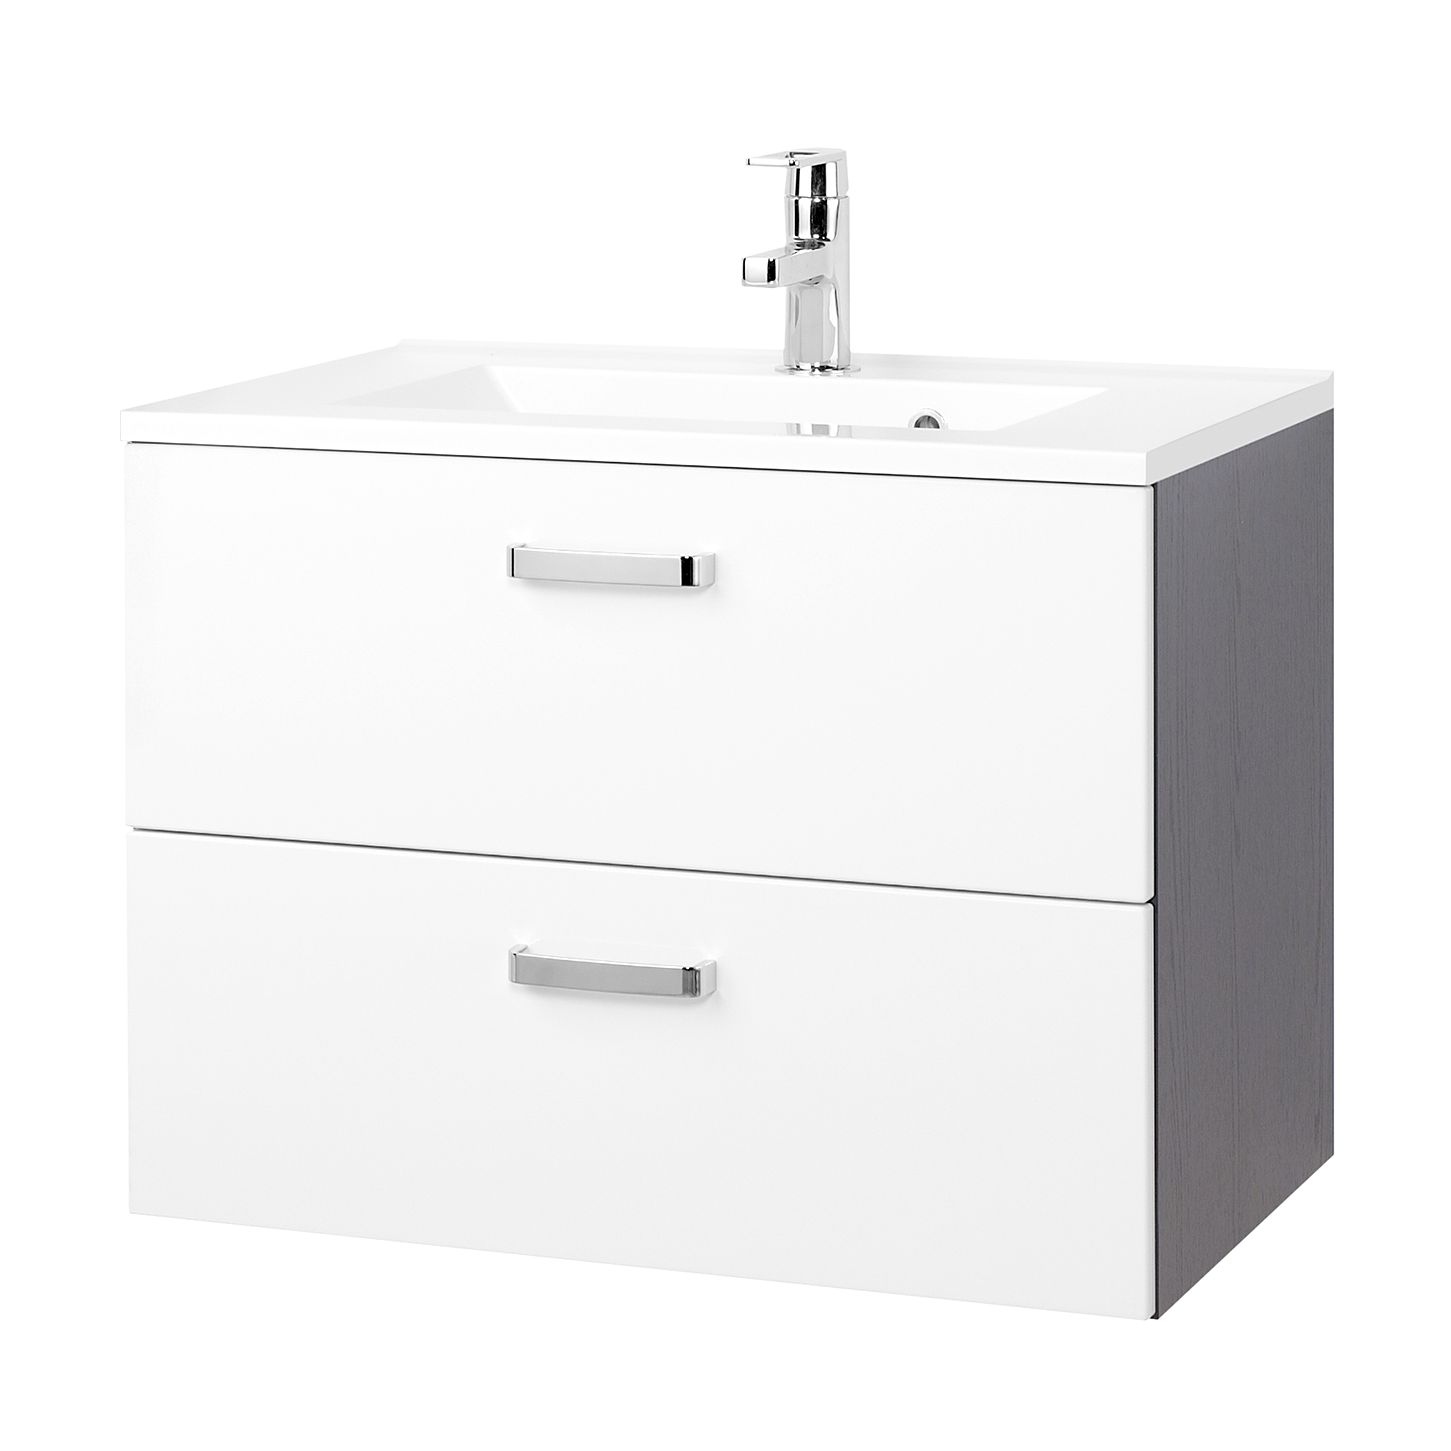 Home 24 - Meuble lavabo zeehan - blanc / gris - 70 cm, giessbach